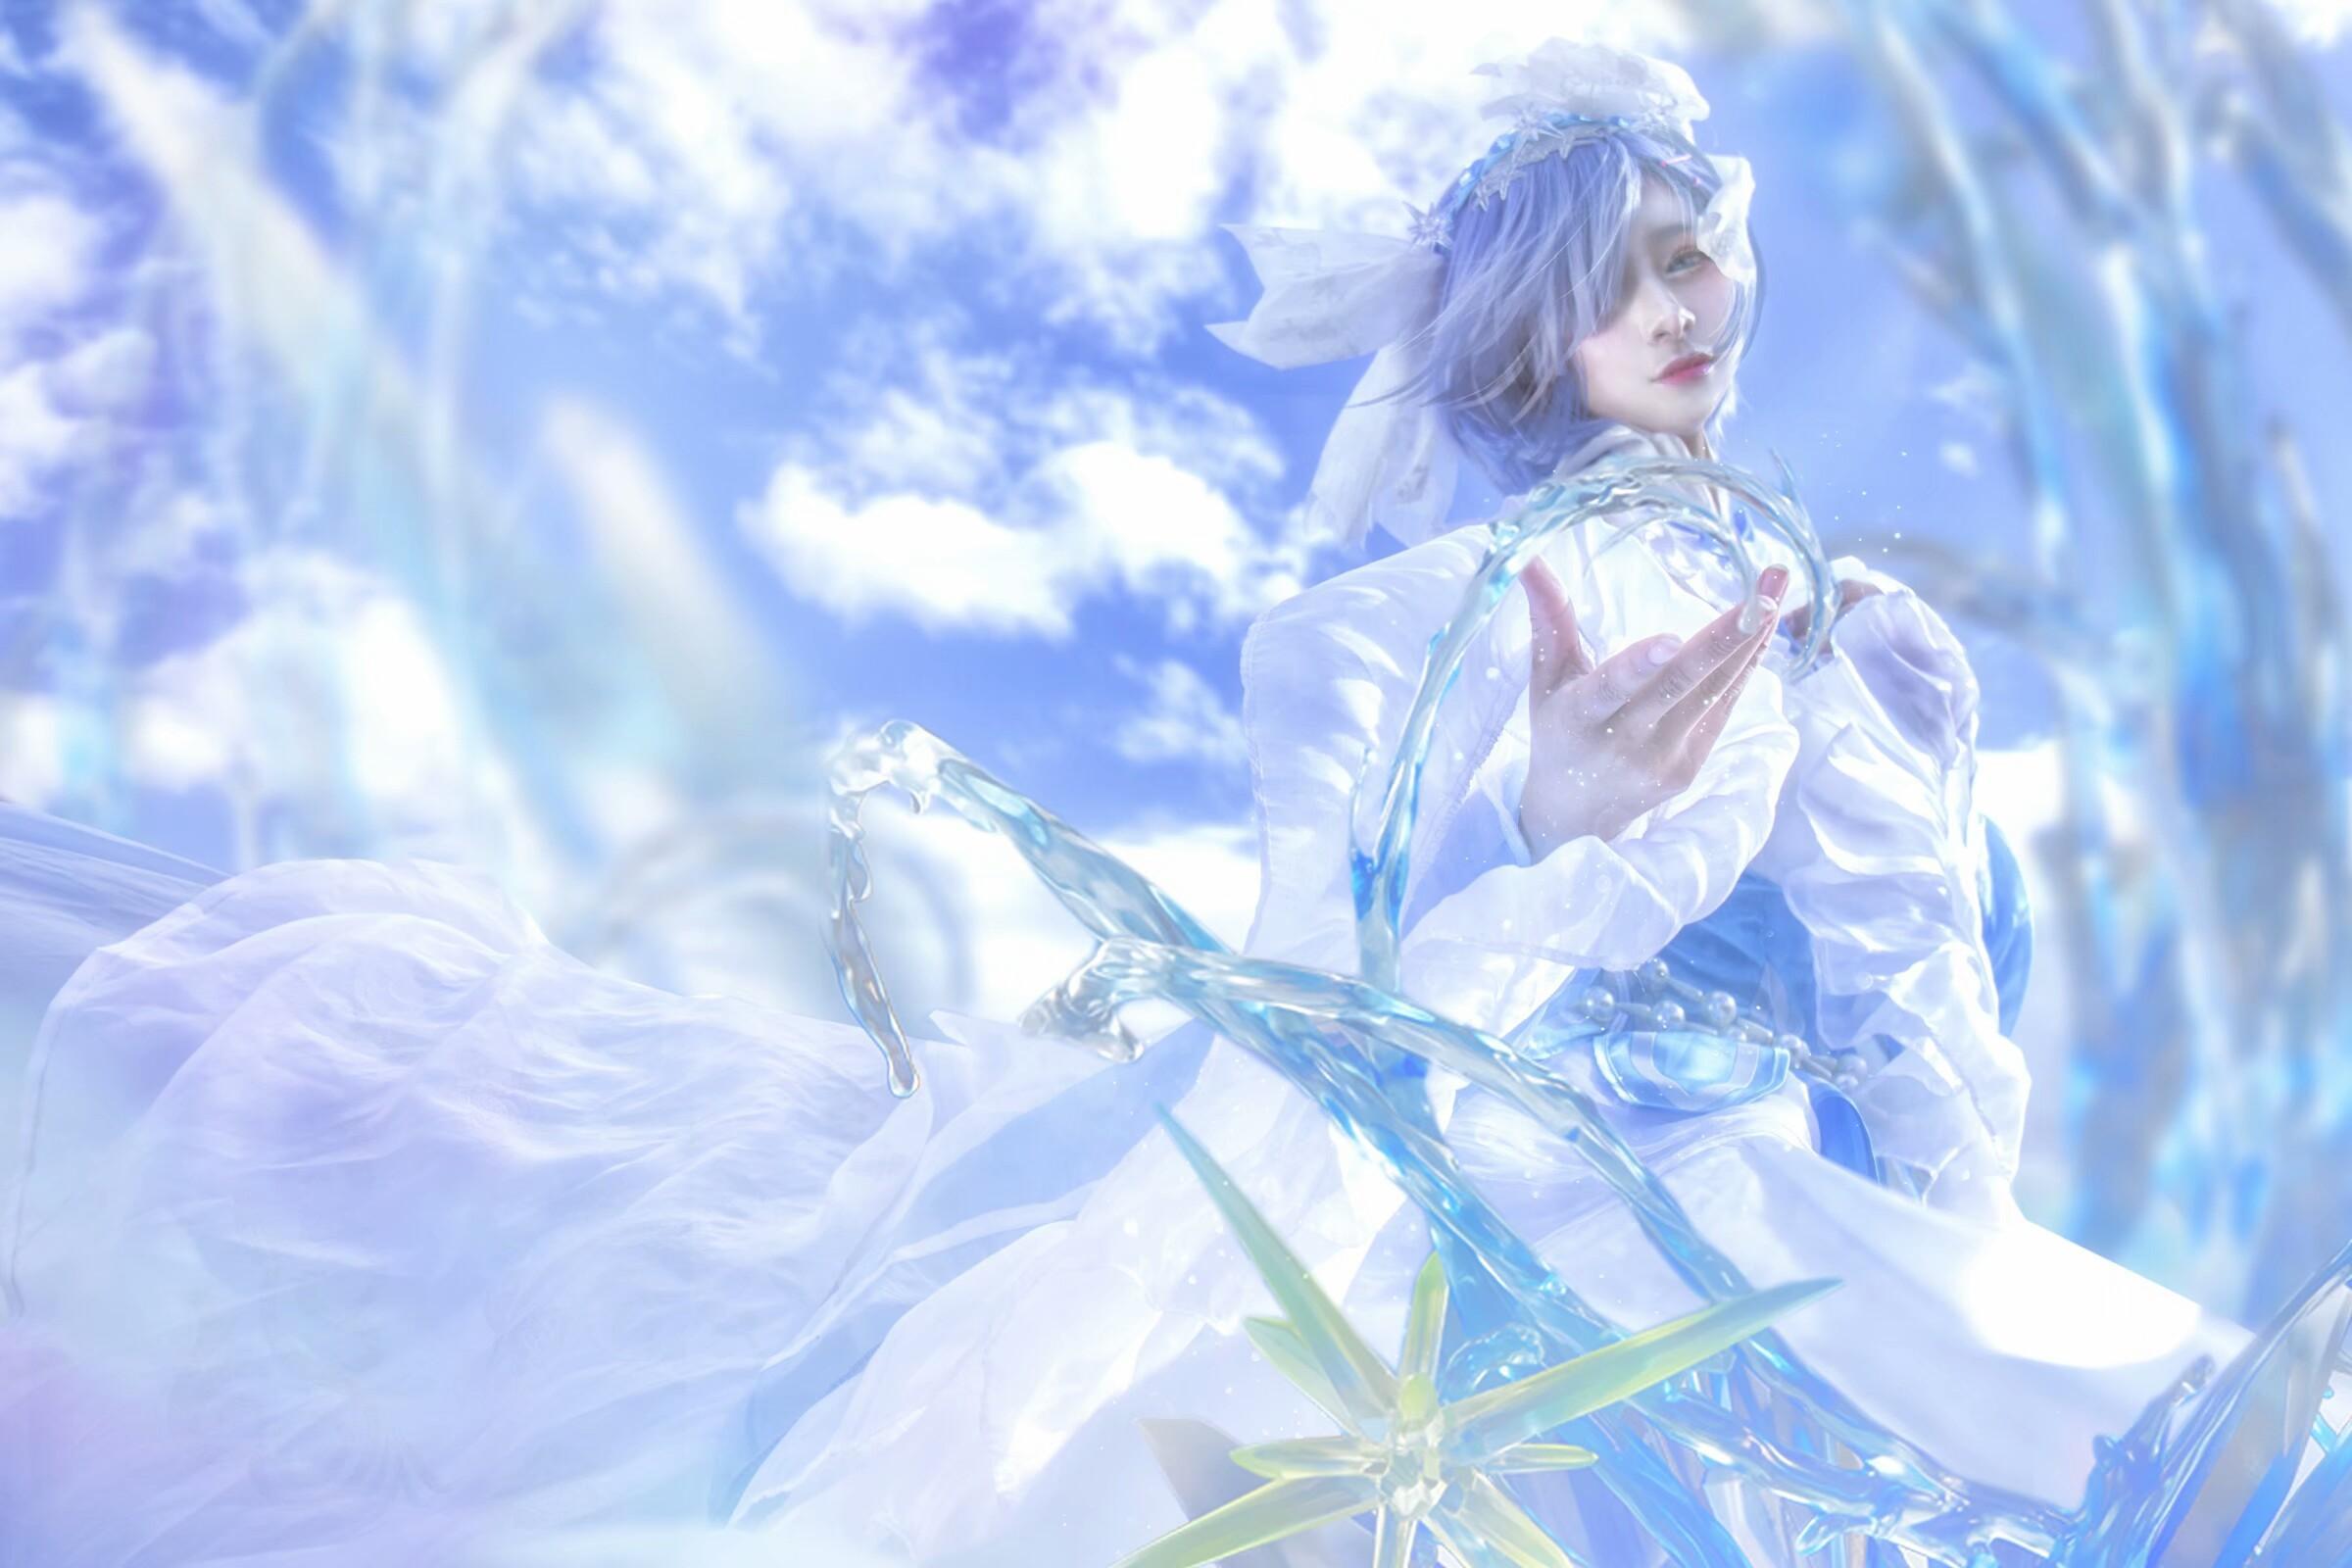 《RE:从零开始的异世界生活》十一cosplay【CN:咸鱼爱扯淡】-第3张